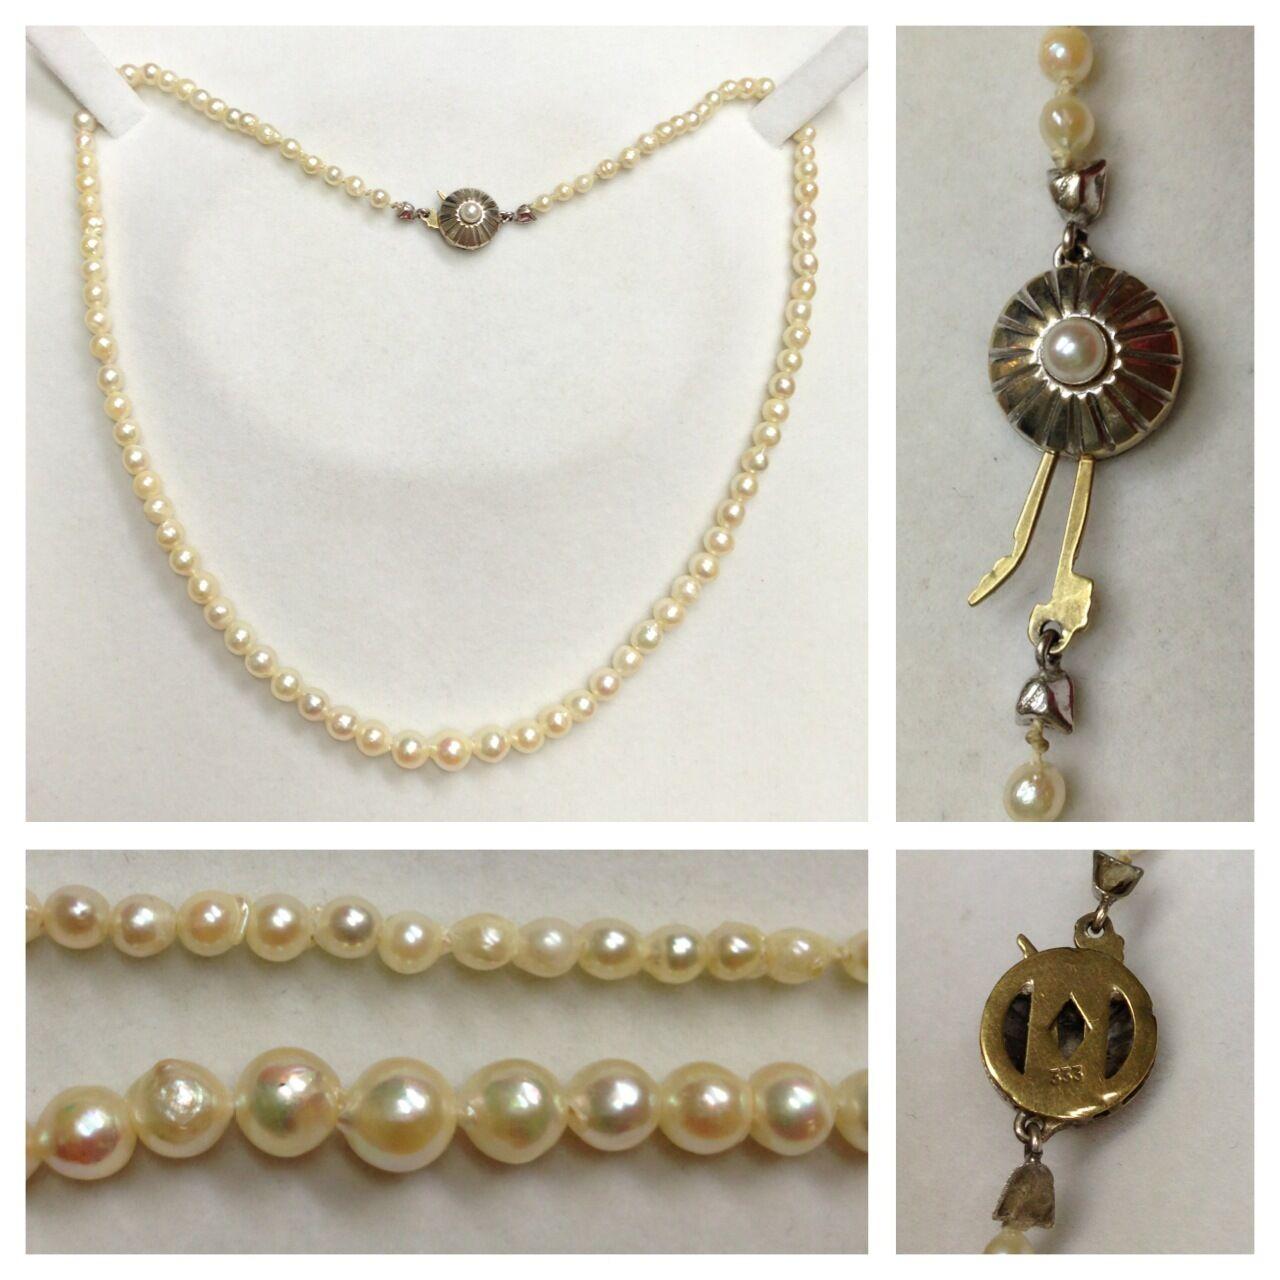 Akoyaperlen Collier Kette 333er goldverschluß whitegold Perlenkette 45,0 cm